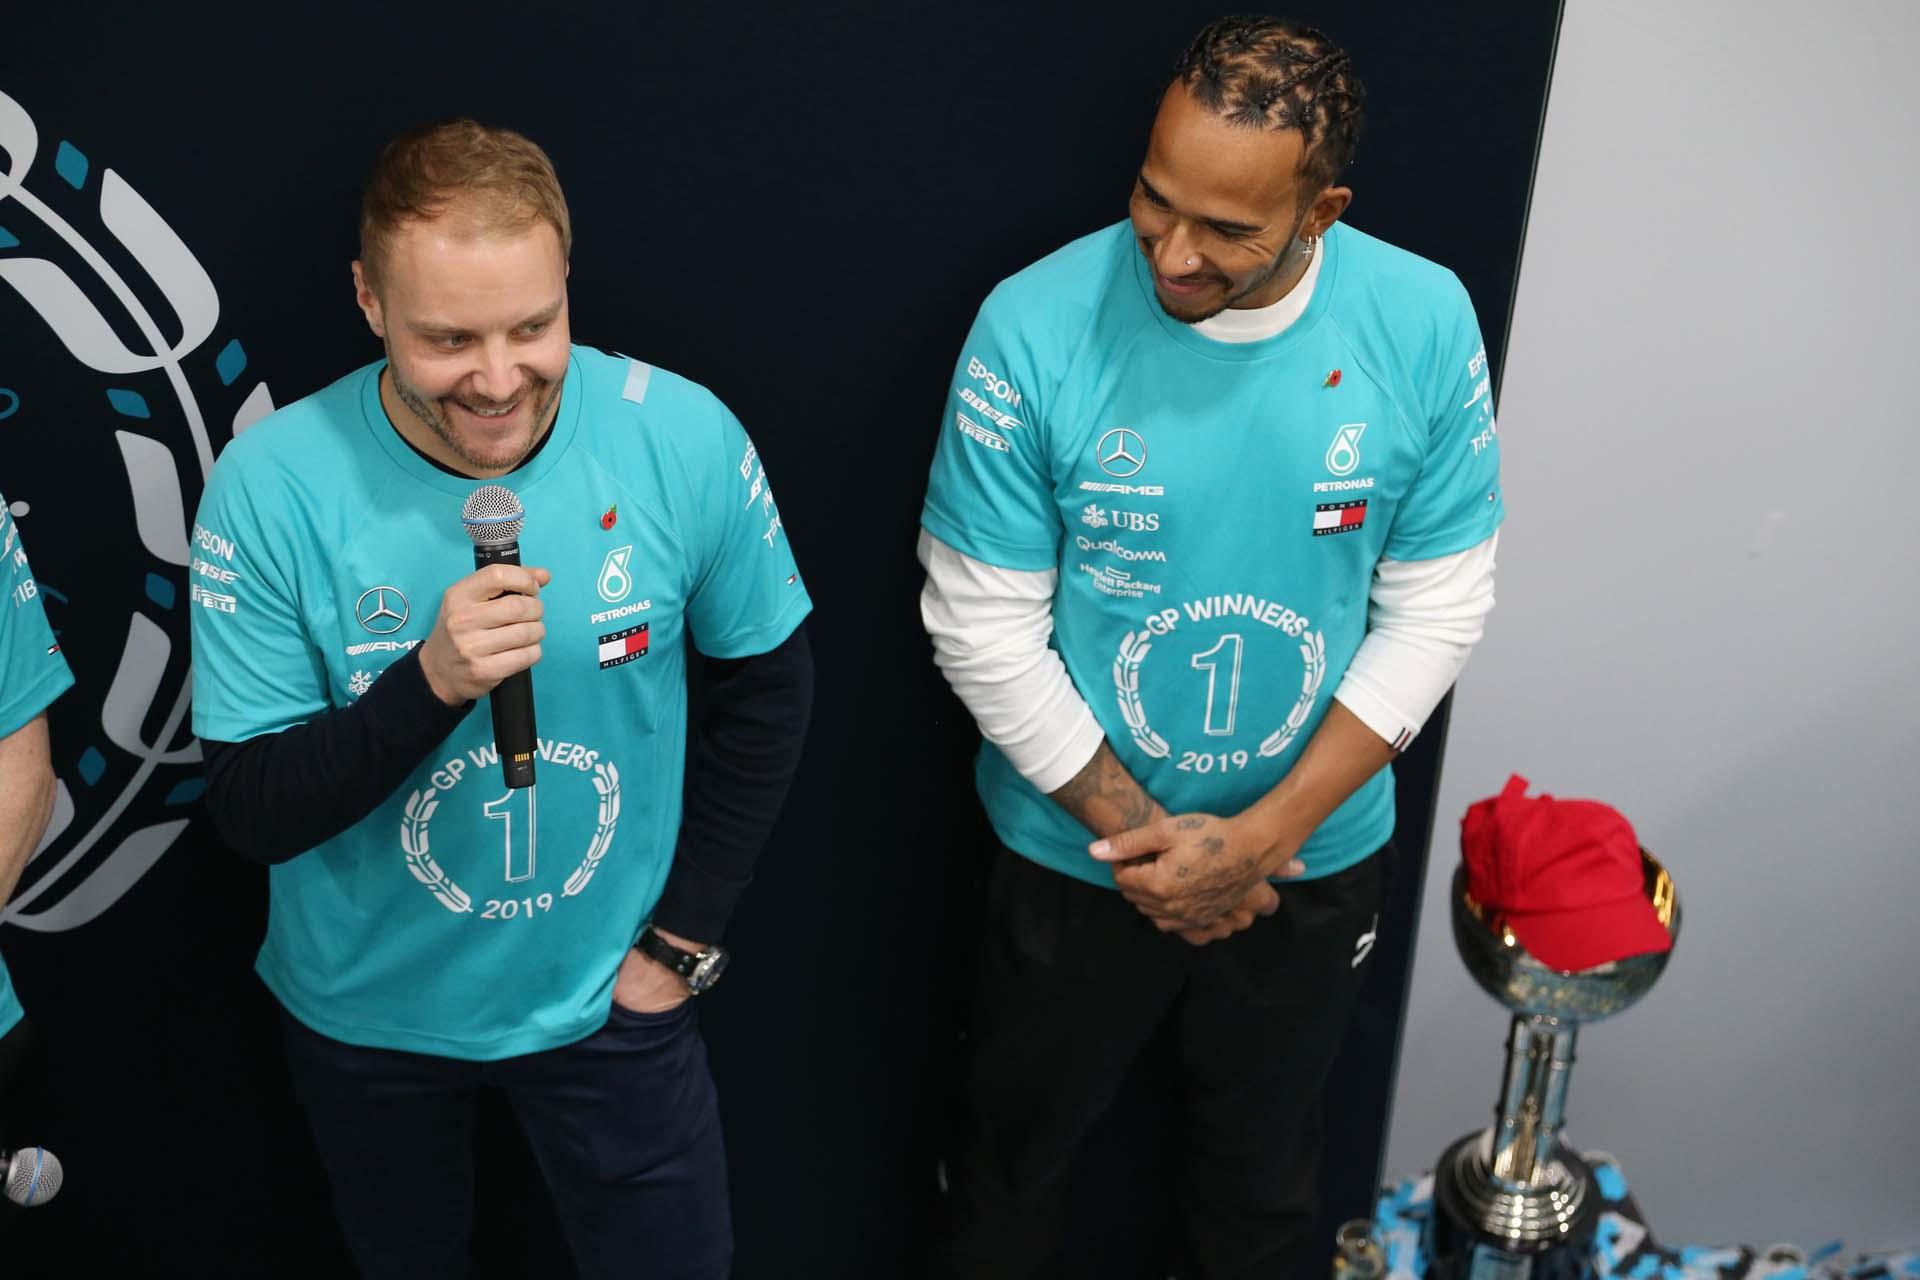 2019 Championship Celebrations - Brackley and Brixworth - Steve Etherington